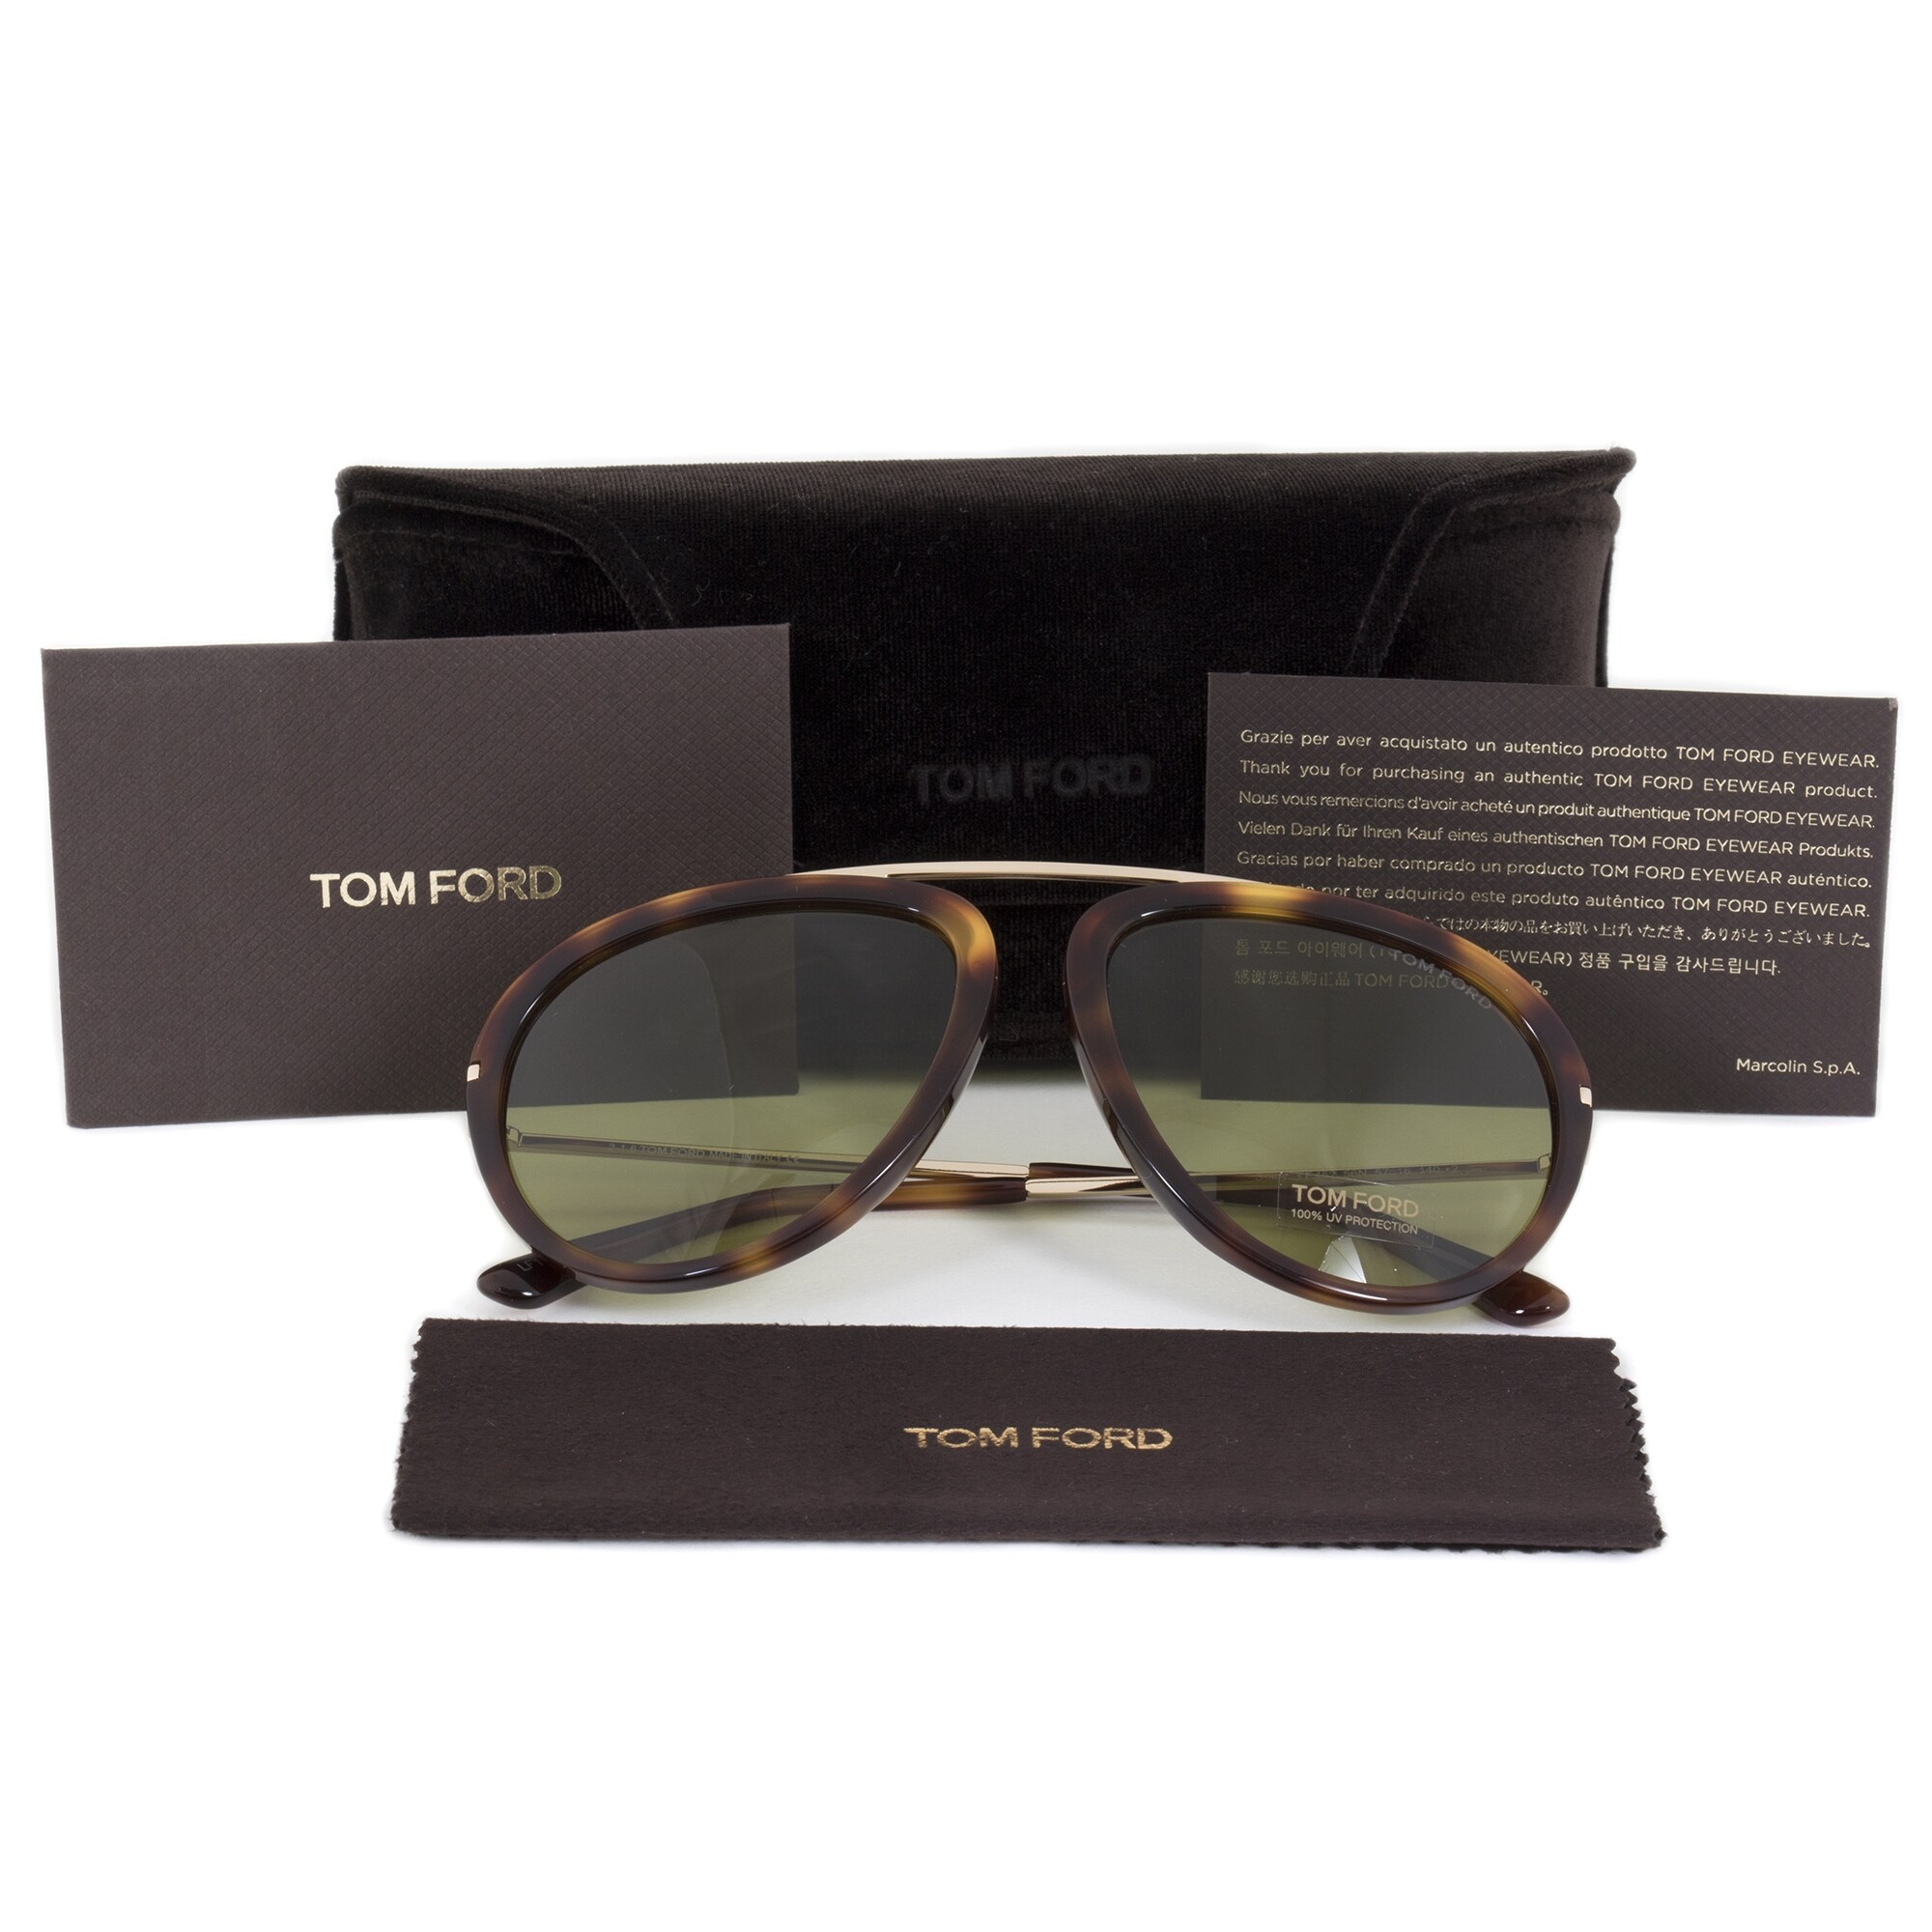 3a6632bbc88c Shop Tom Ford Stacy Men s Aviator Sunglasses FT0452 56N 57